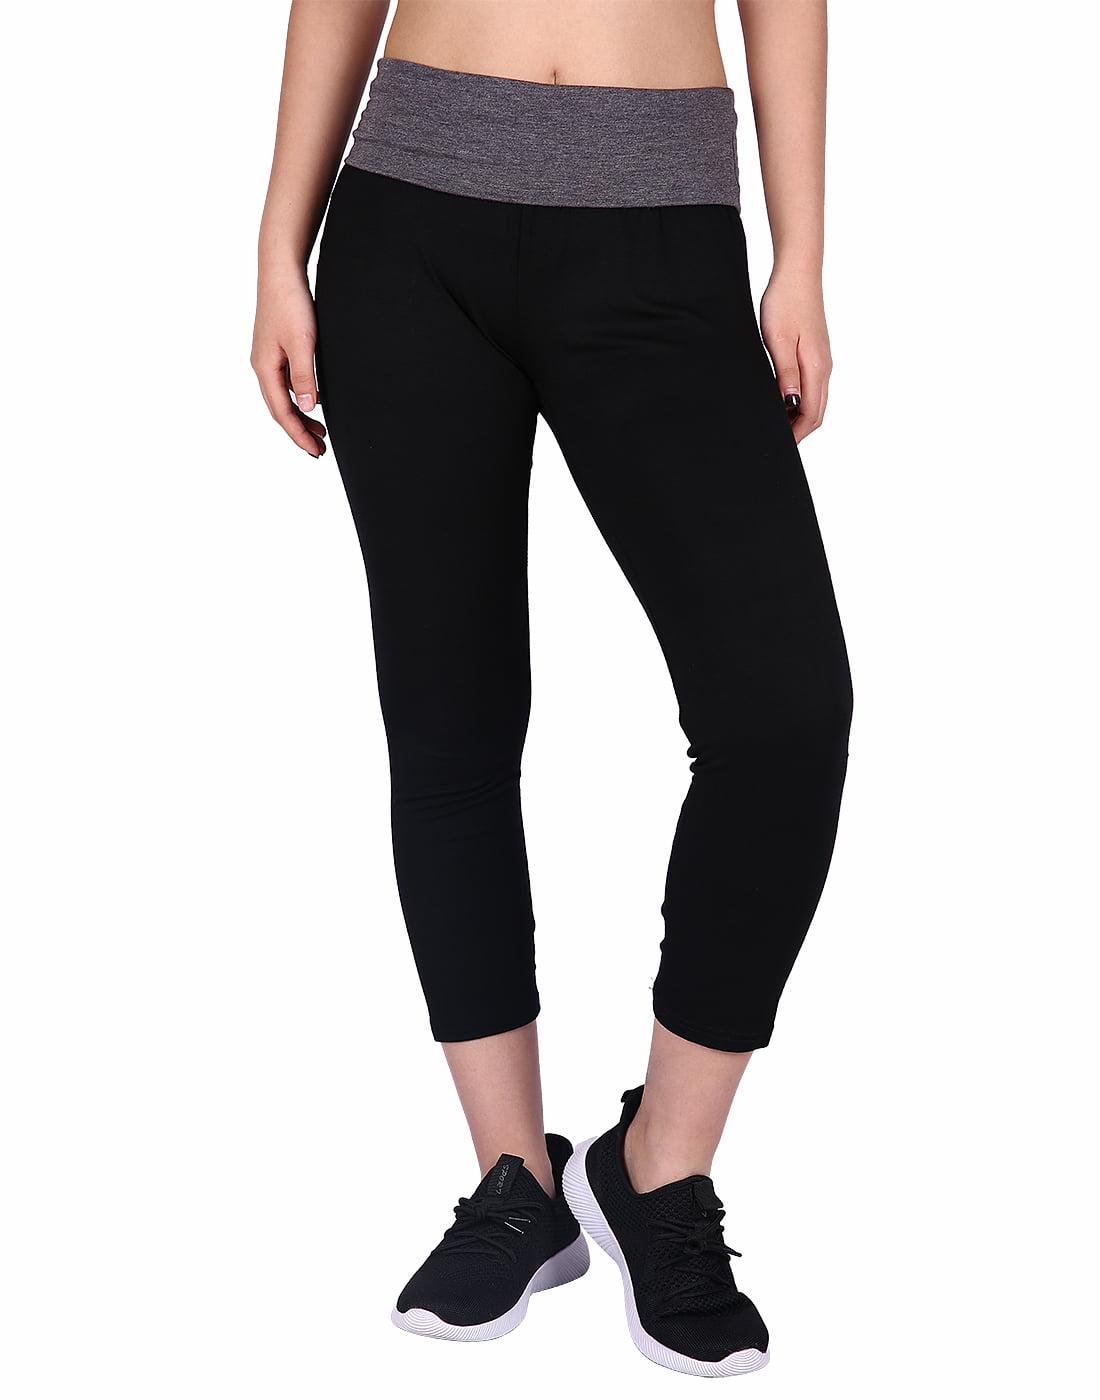 HDE Women's Yoga Capri Pants Color Block Fold Over Waist Workout Leggings (Black w/Charcoal, Small)